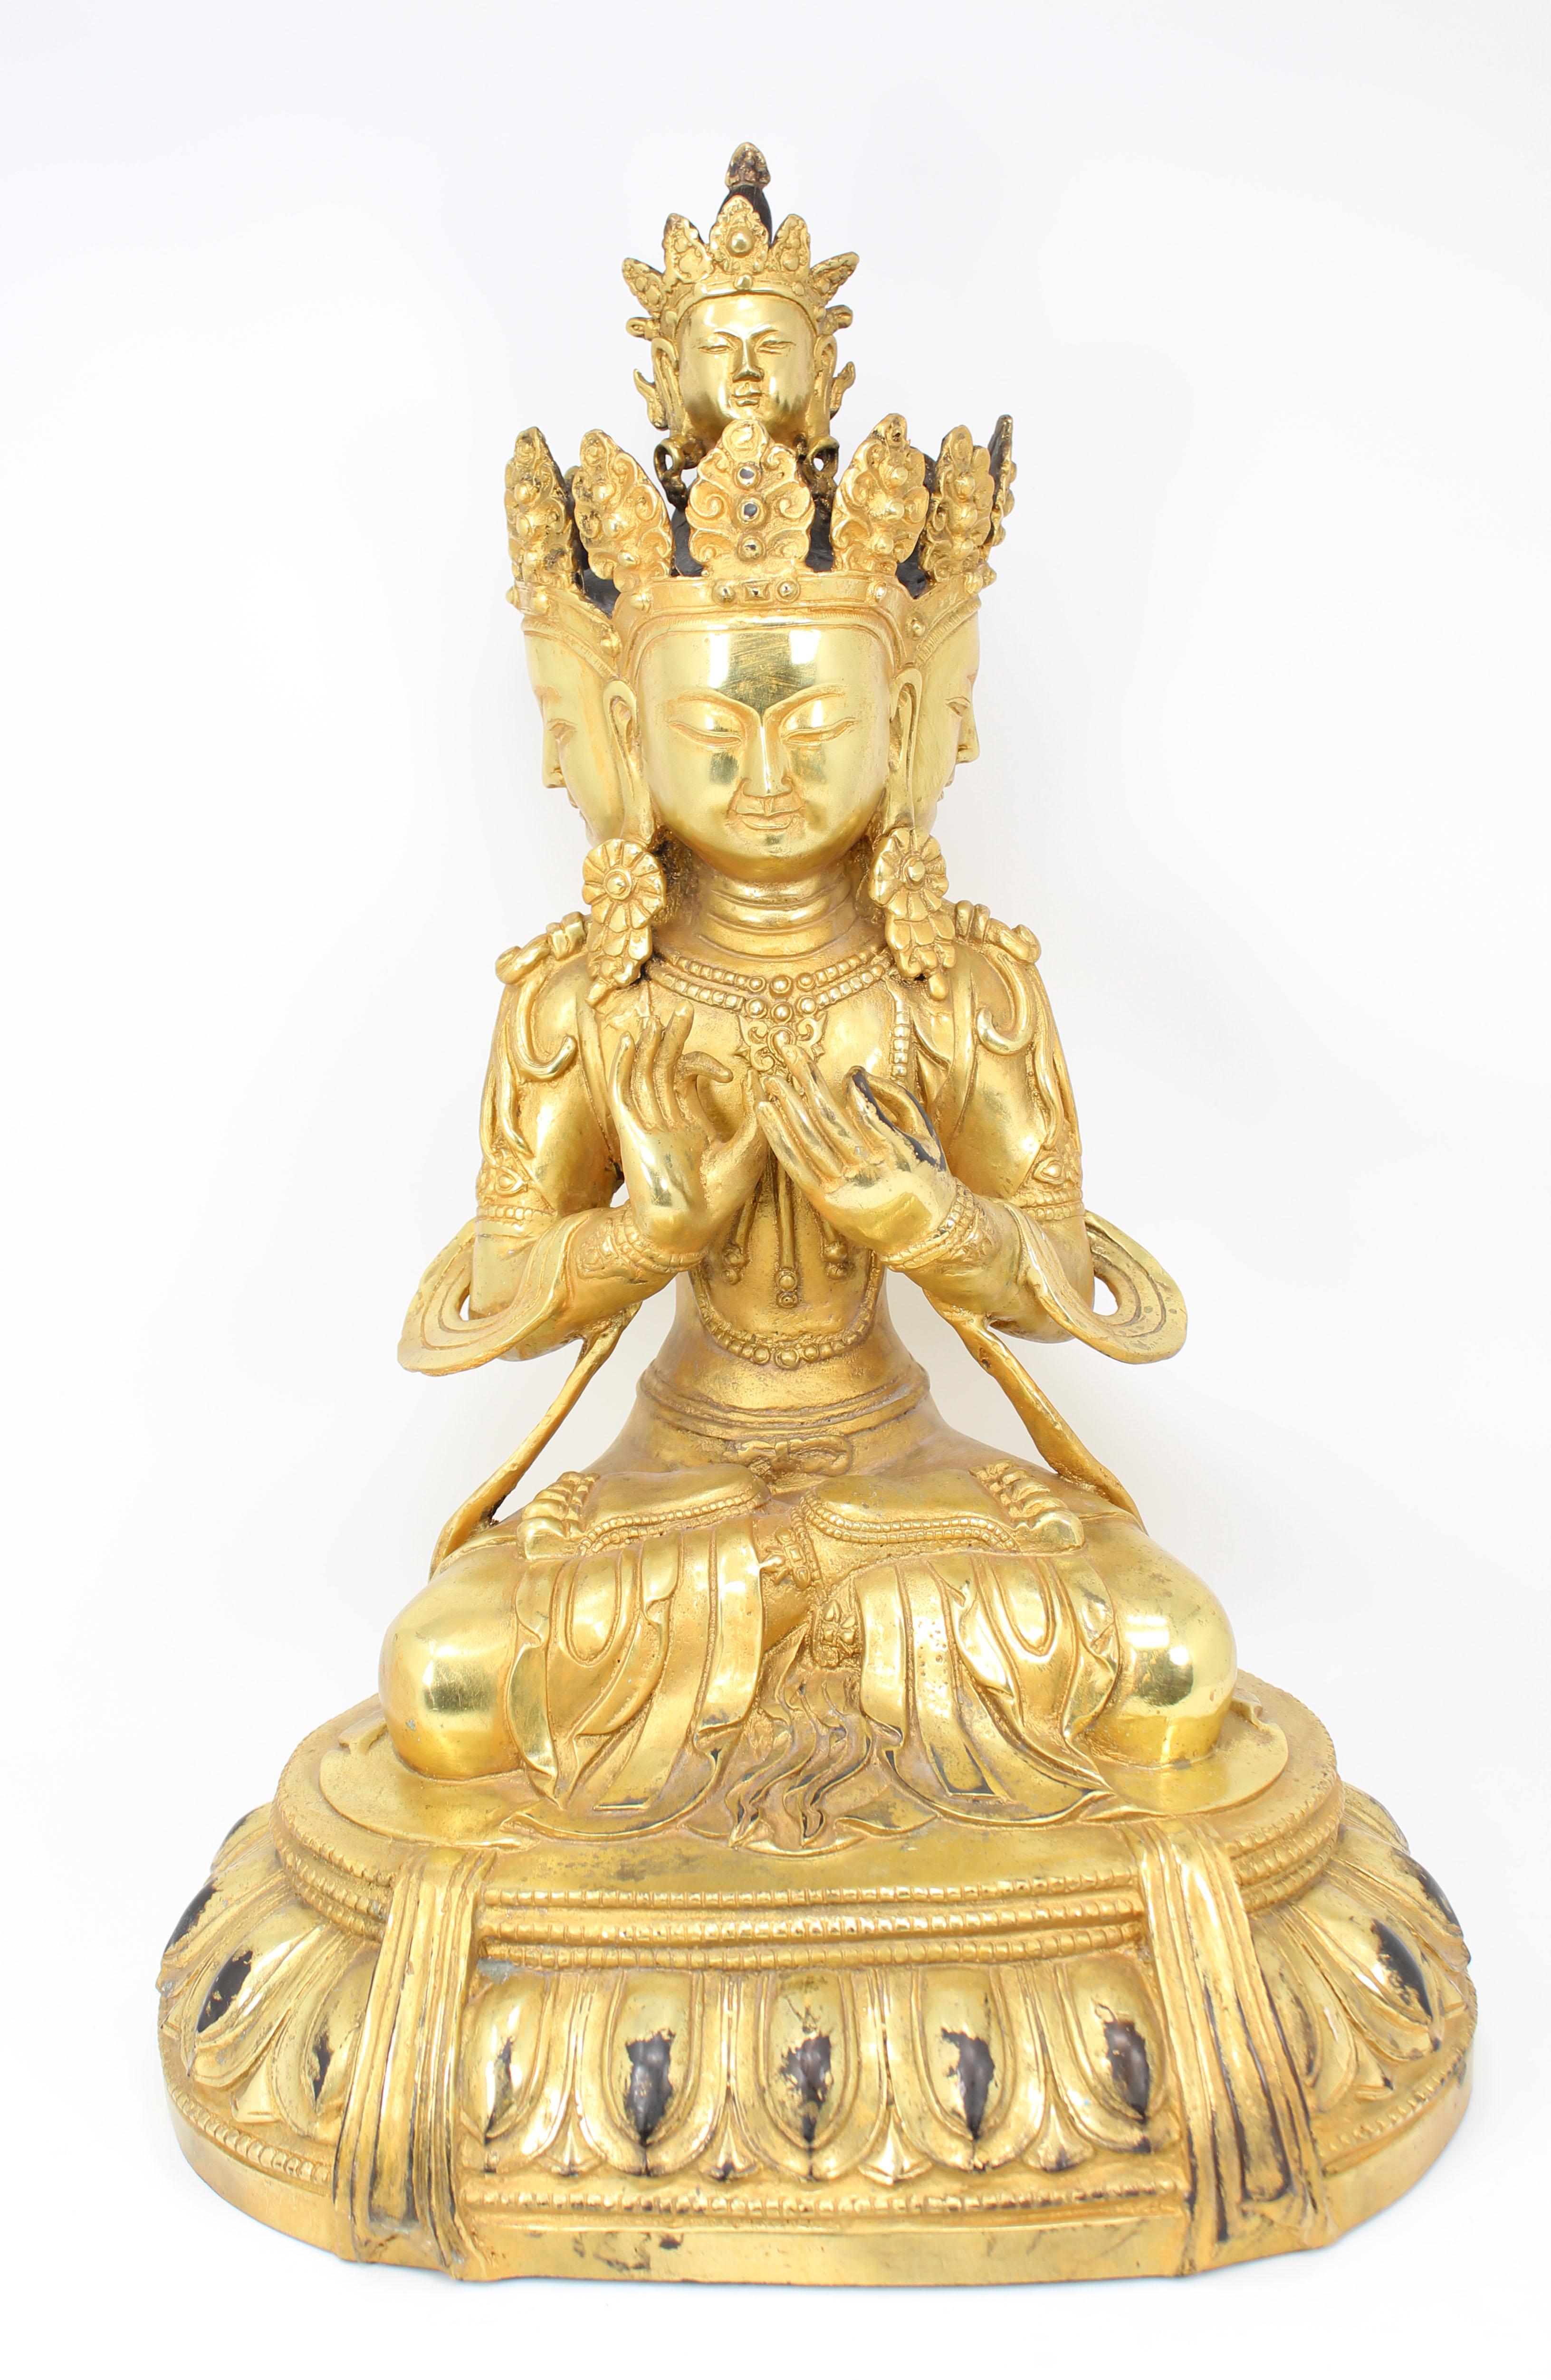 Lot 30 - Antique Gilt Bronze Tibetan Bodhisattva Vasundhara